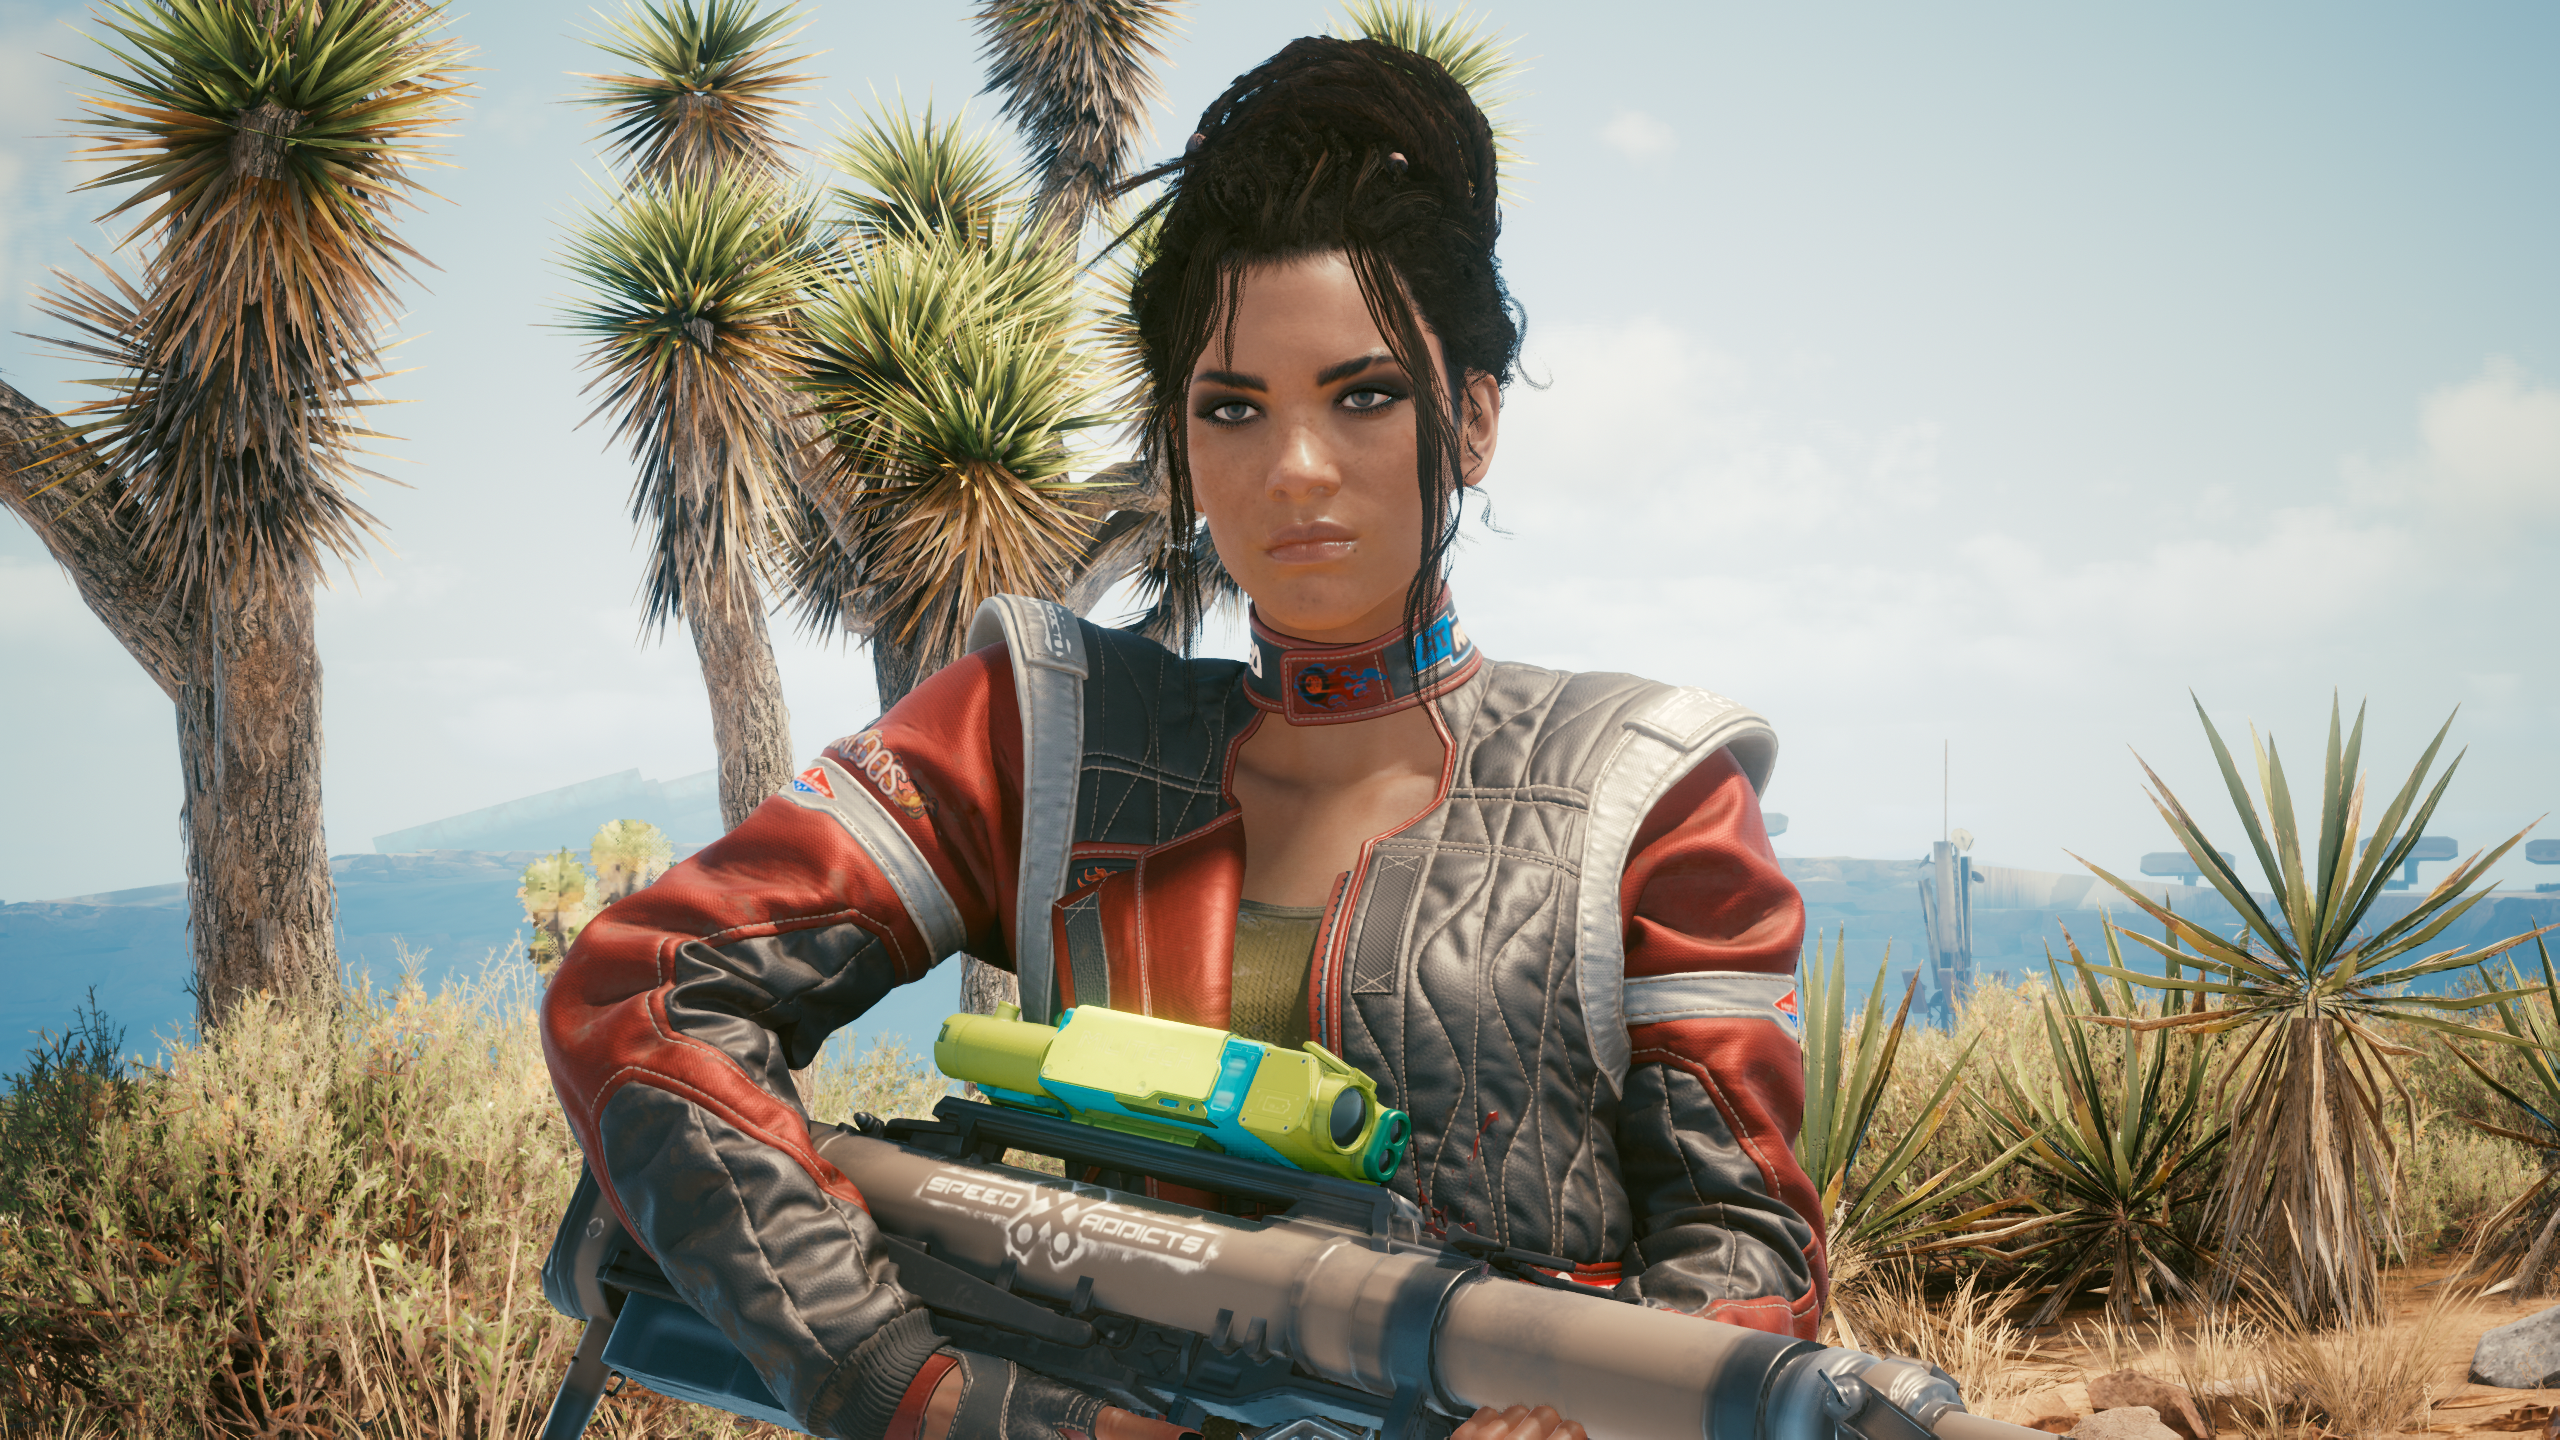 Cyberpunk 2077 expansions are still in development, CD Projekt confirms